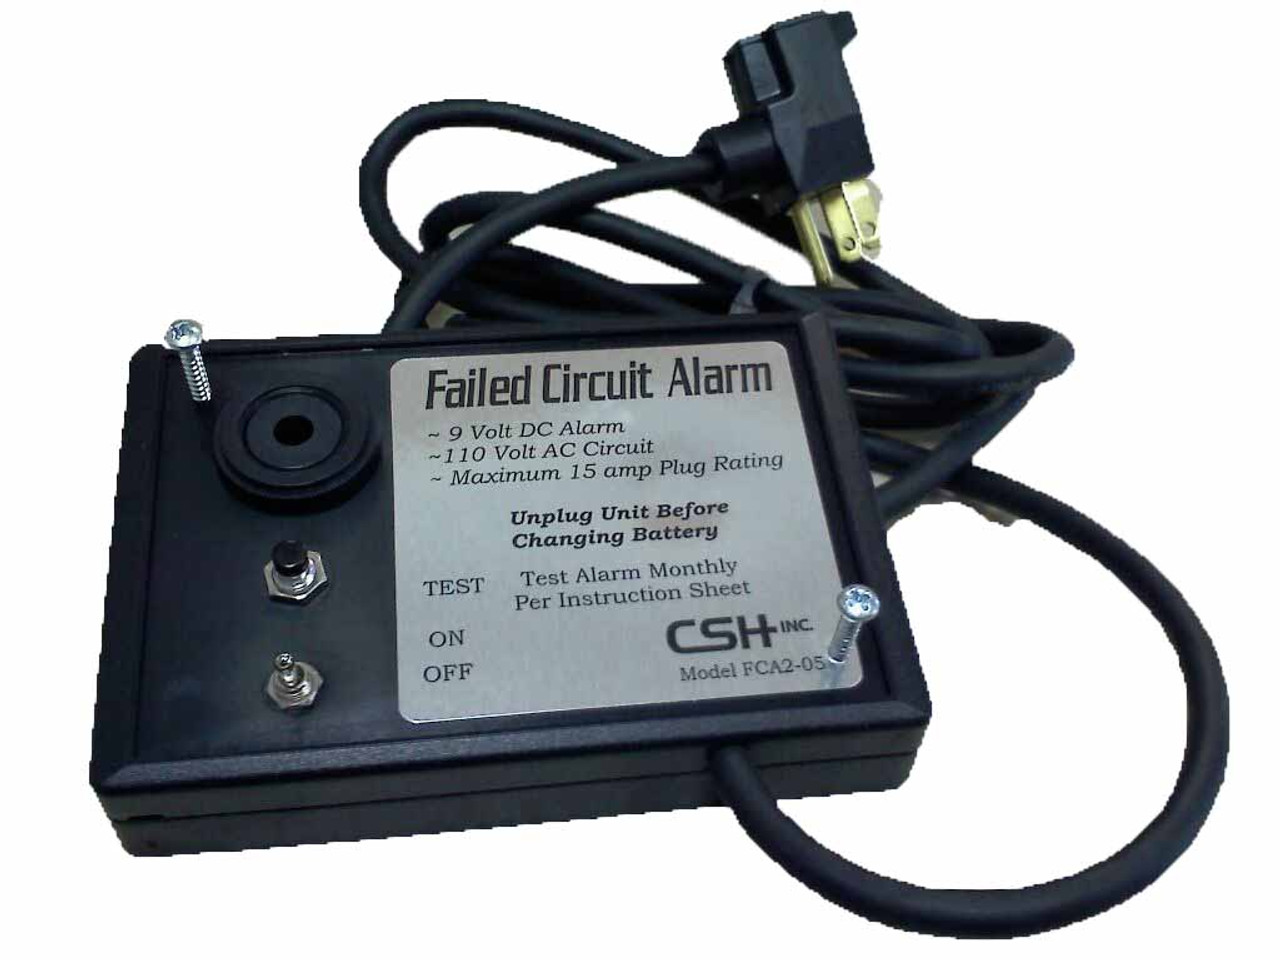 3295 Fca2 05 15 Failed Circuit Alarm Power Failure Auto Laptop Reset